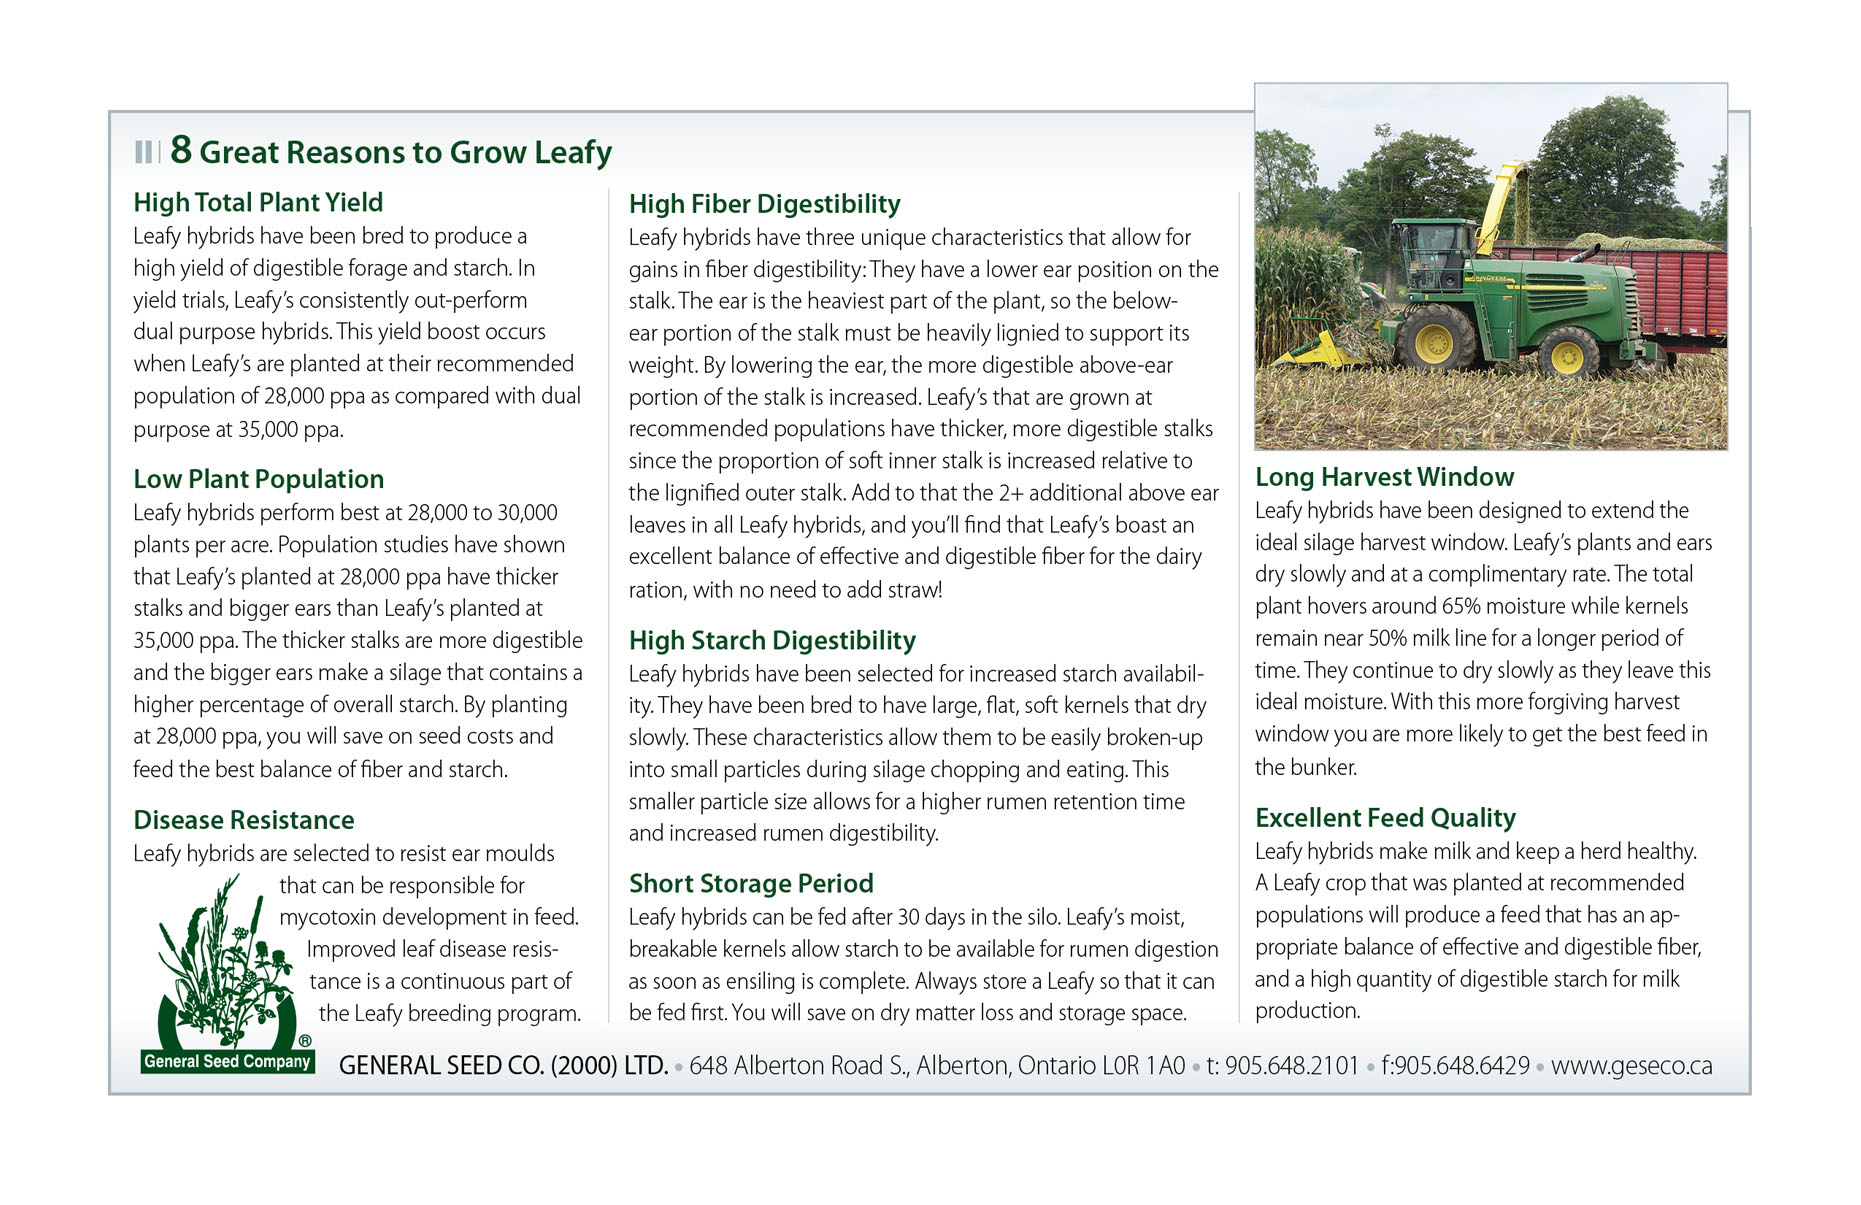 Grow Leafy Corn general seed company